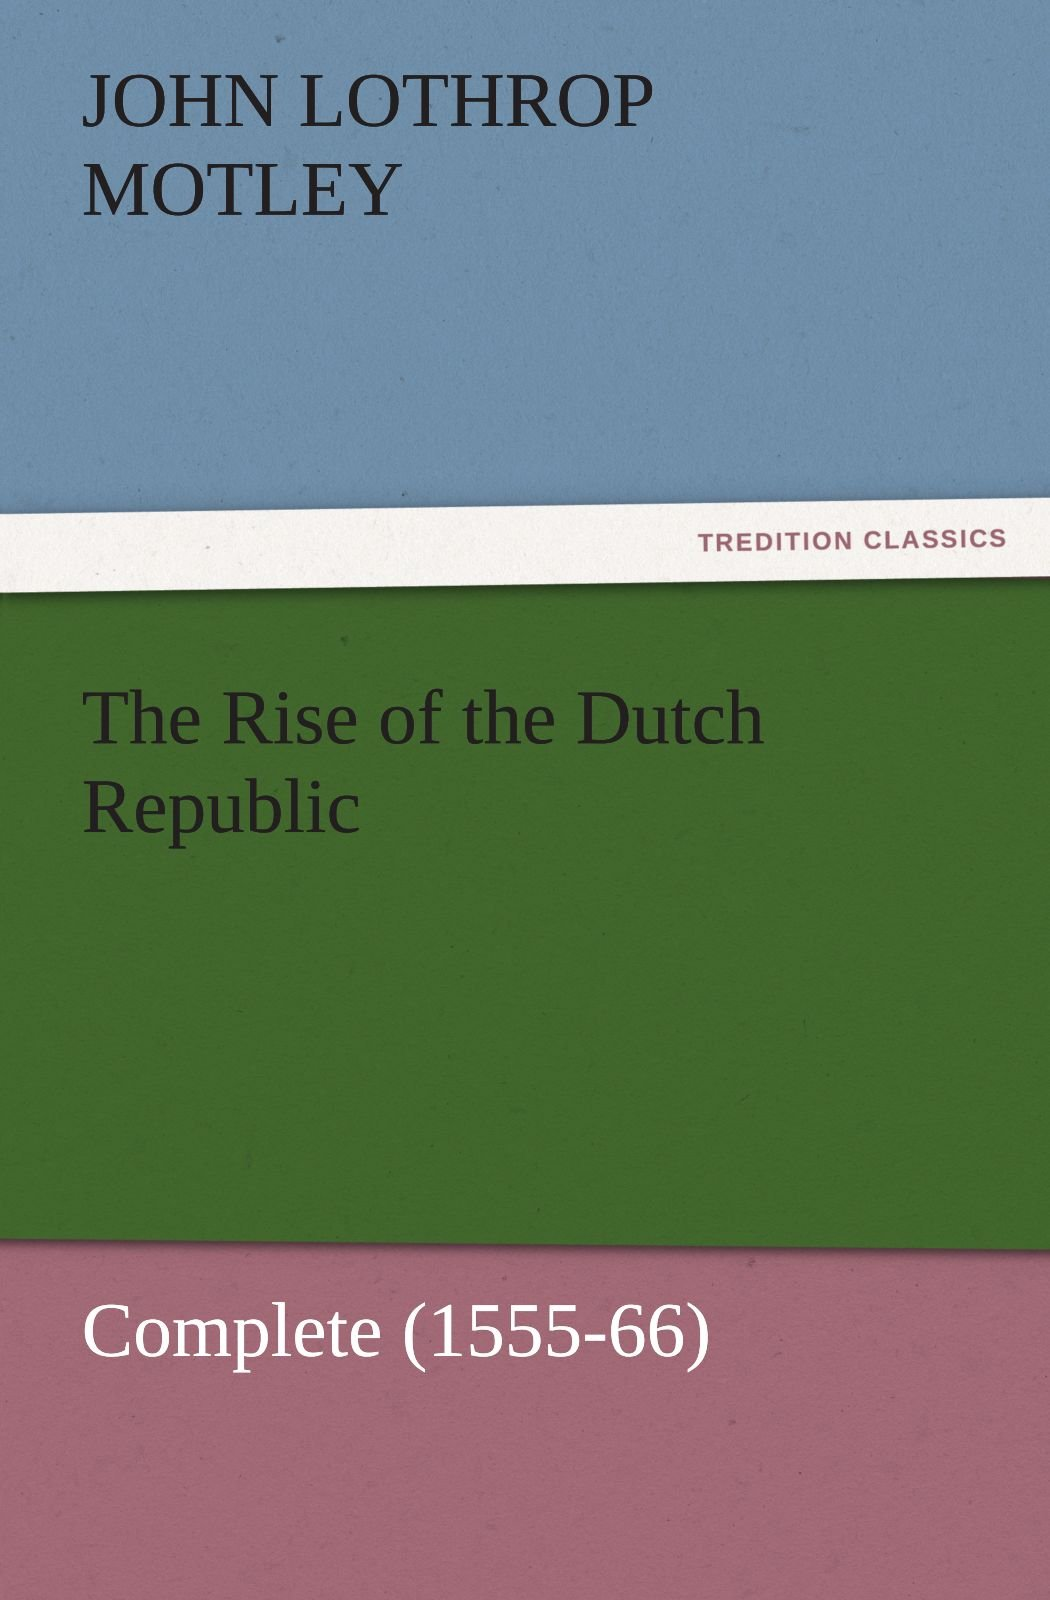 The Rise of the Dutch Republic — Complete (1555-66) (TREDITION CLASSICS) ebook